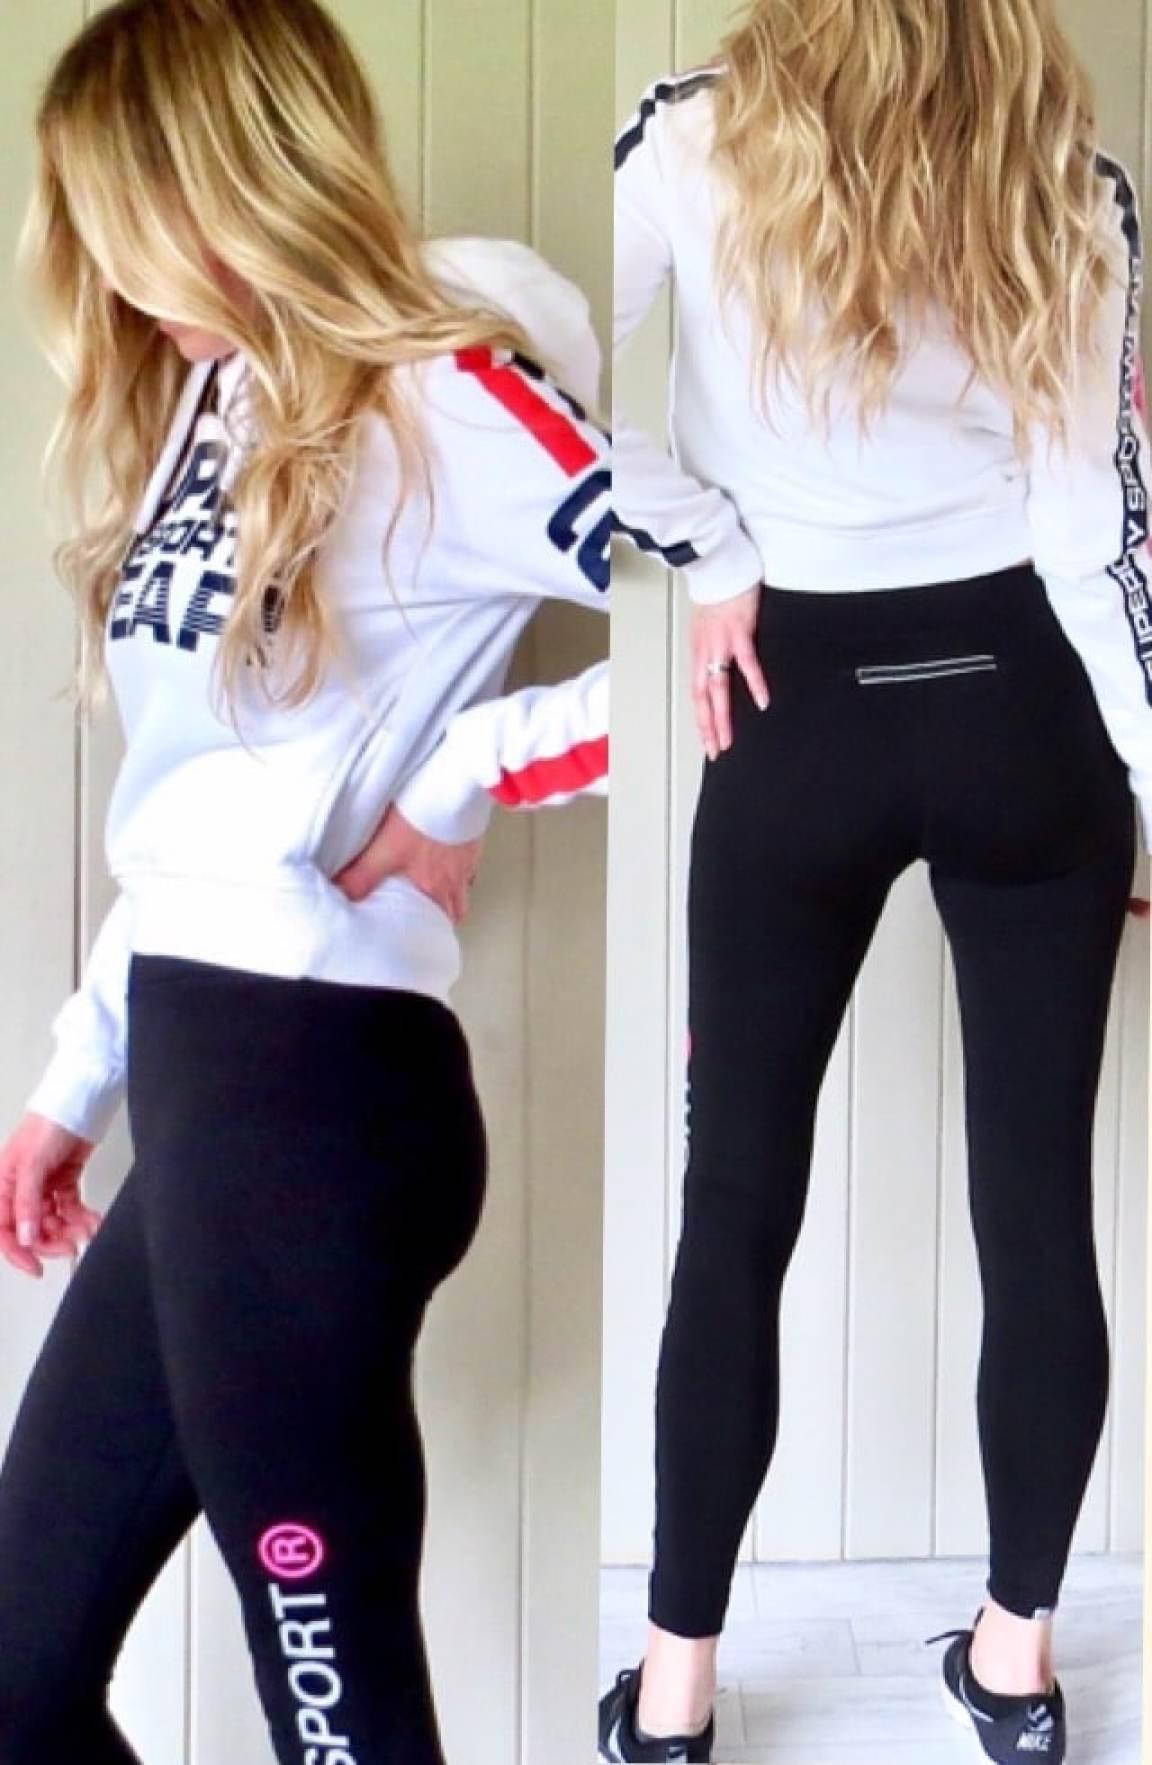 Samantha wearing the Superdry leggings